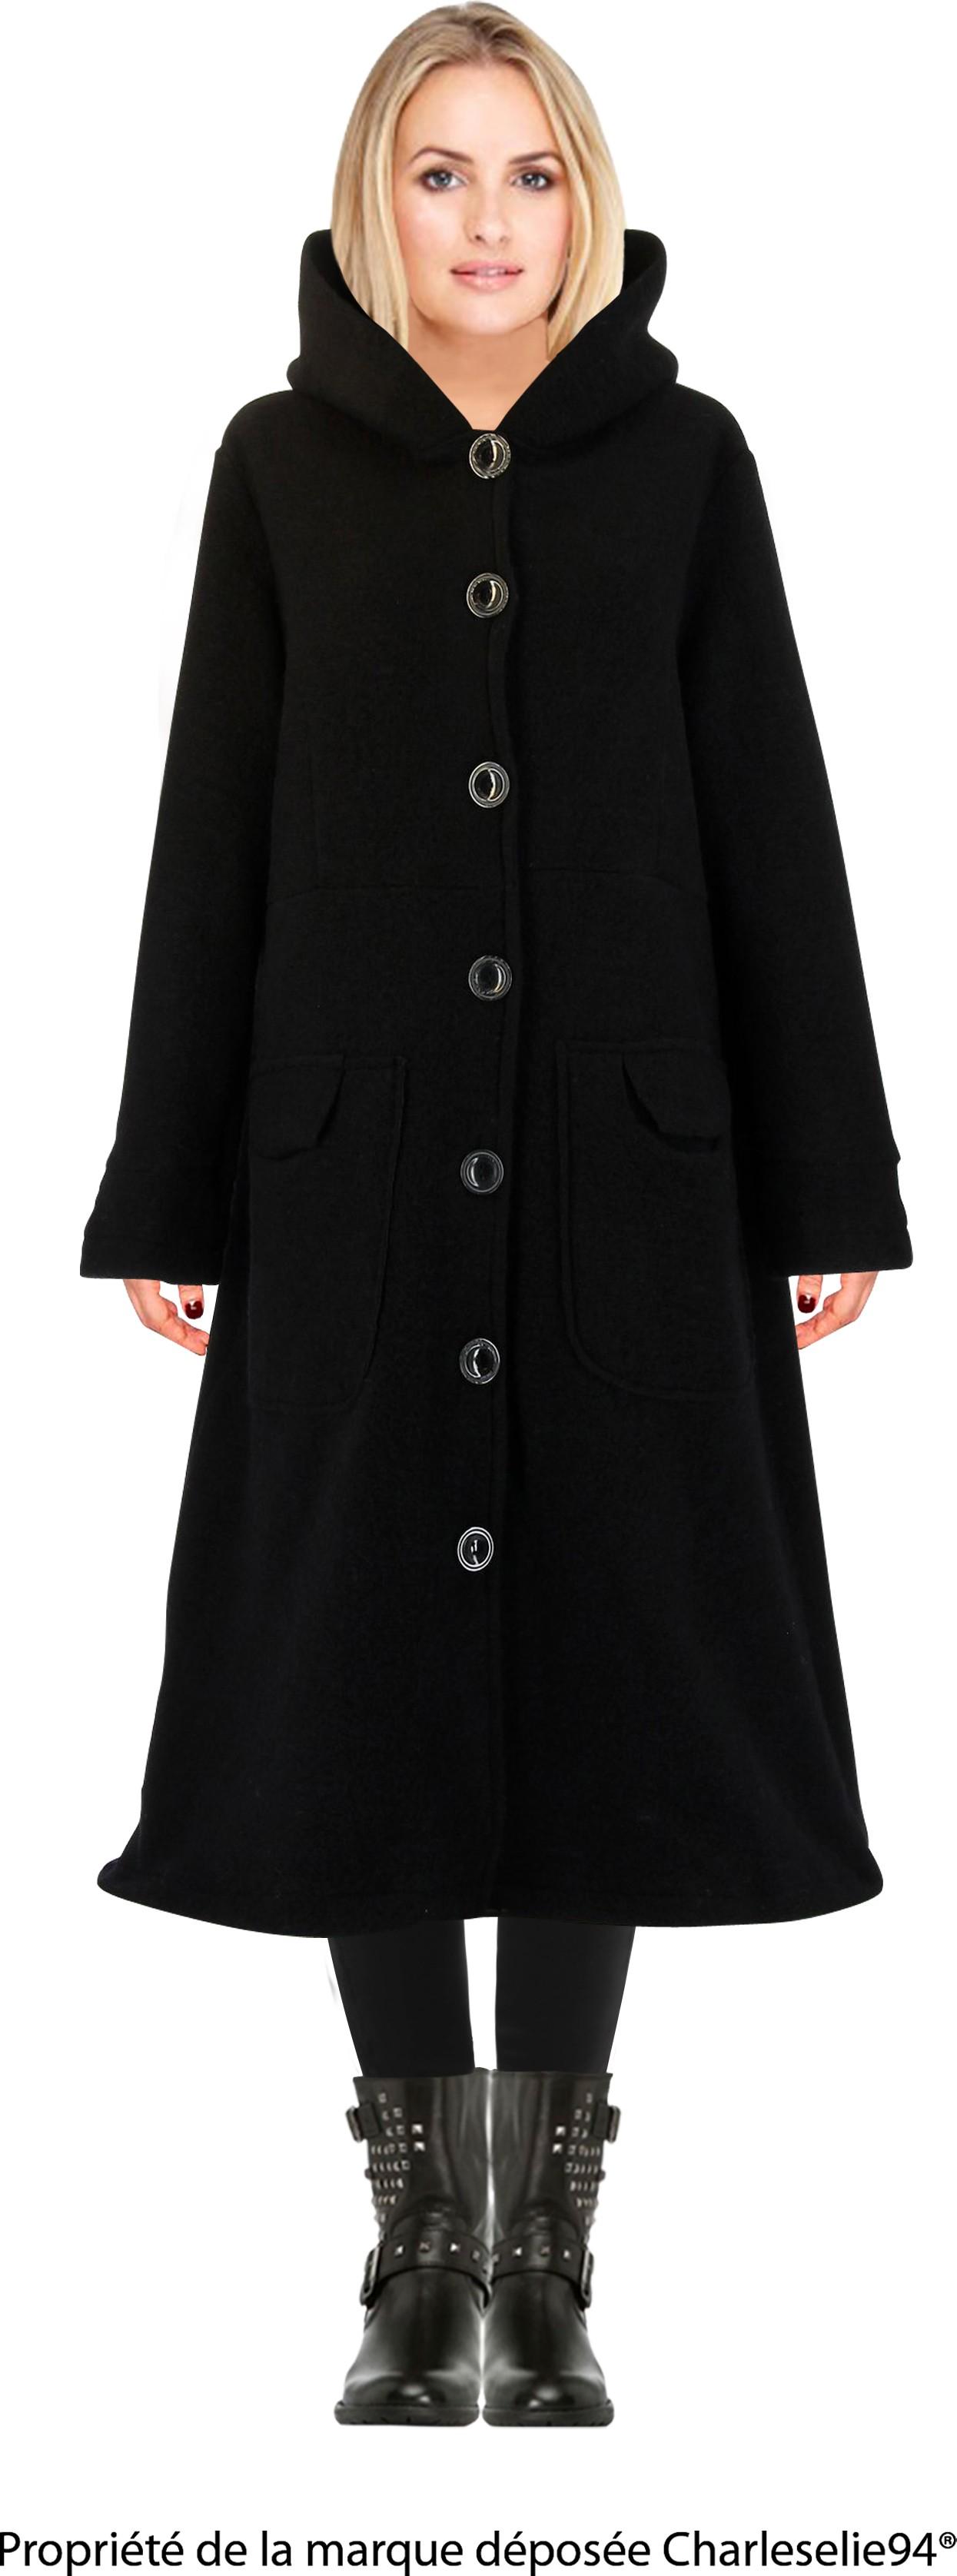 manteau sympa grande taille manteaux populaires et branch s en france. Black Bedroom Furniture Sets. Home Design Ideas